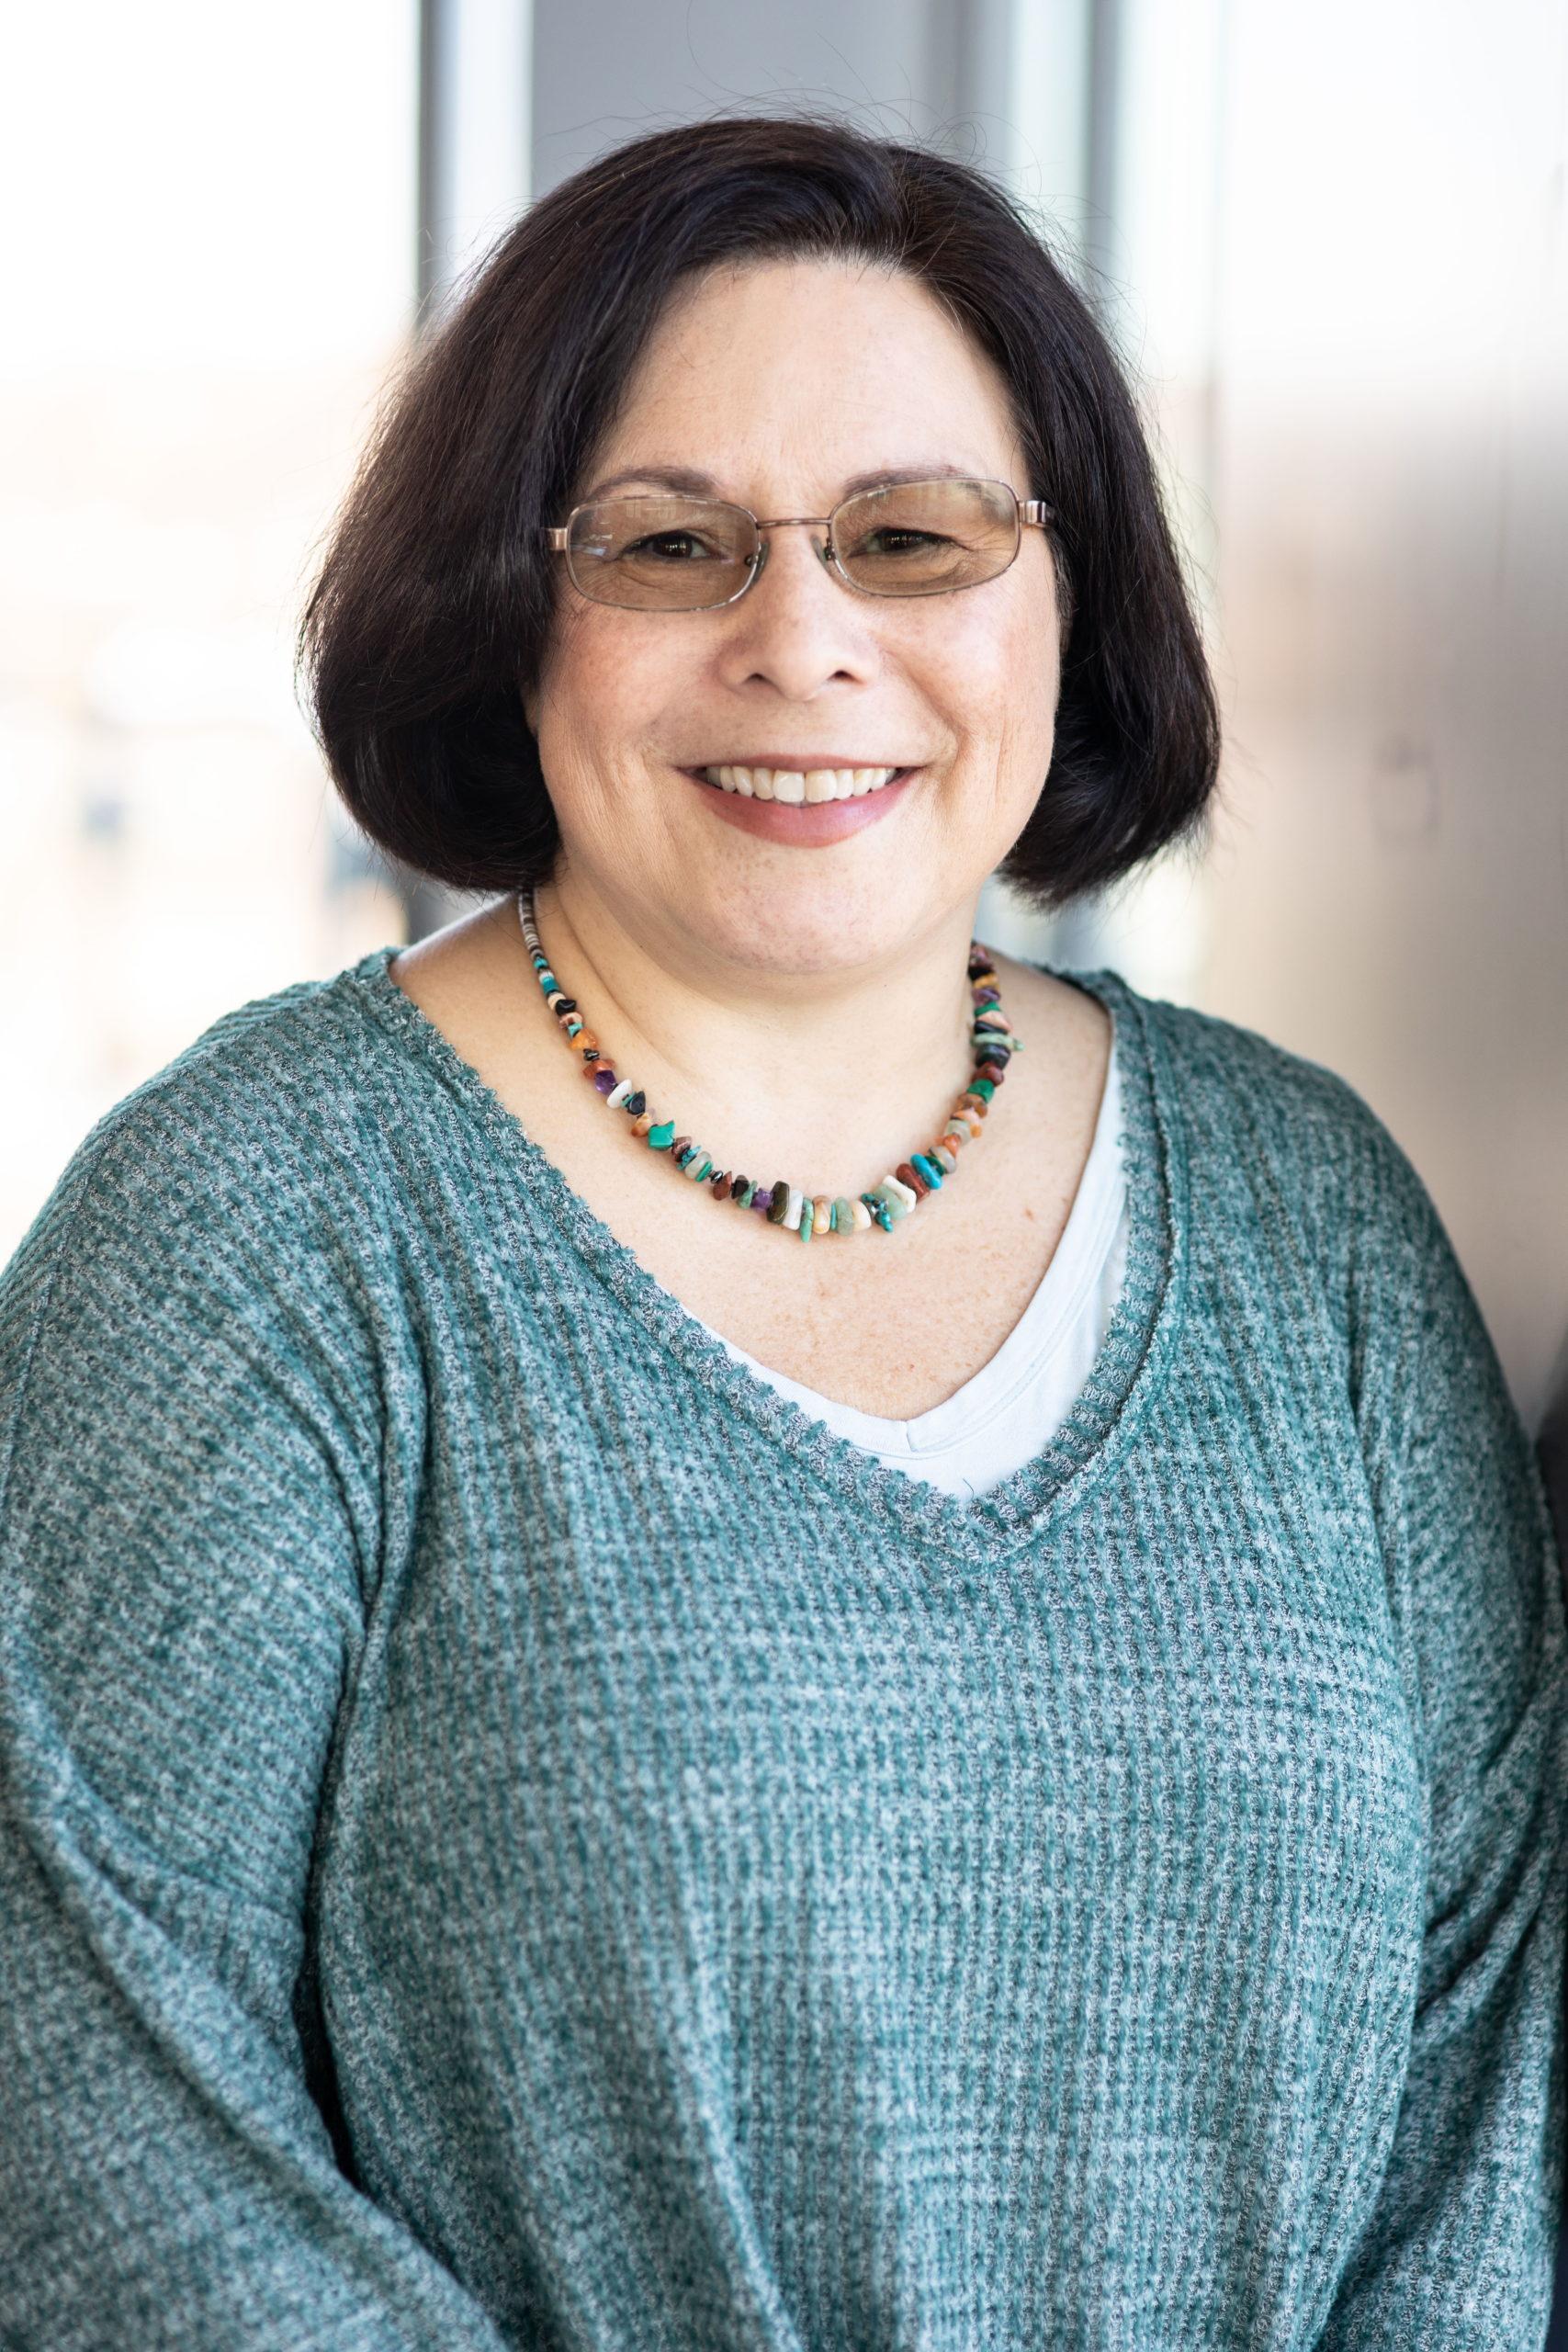 Adriana Carr is the Principal of Senior Life Enrichment.